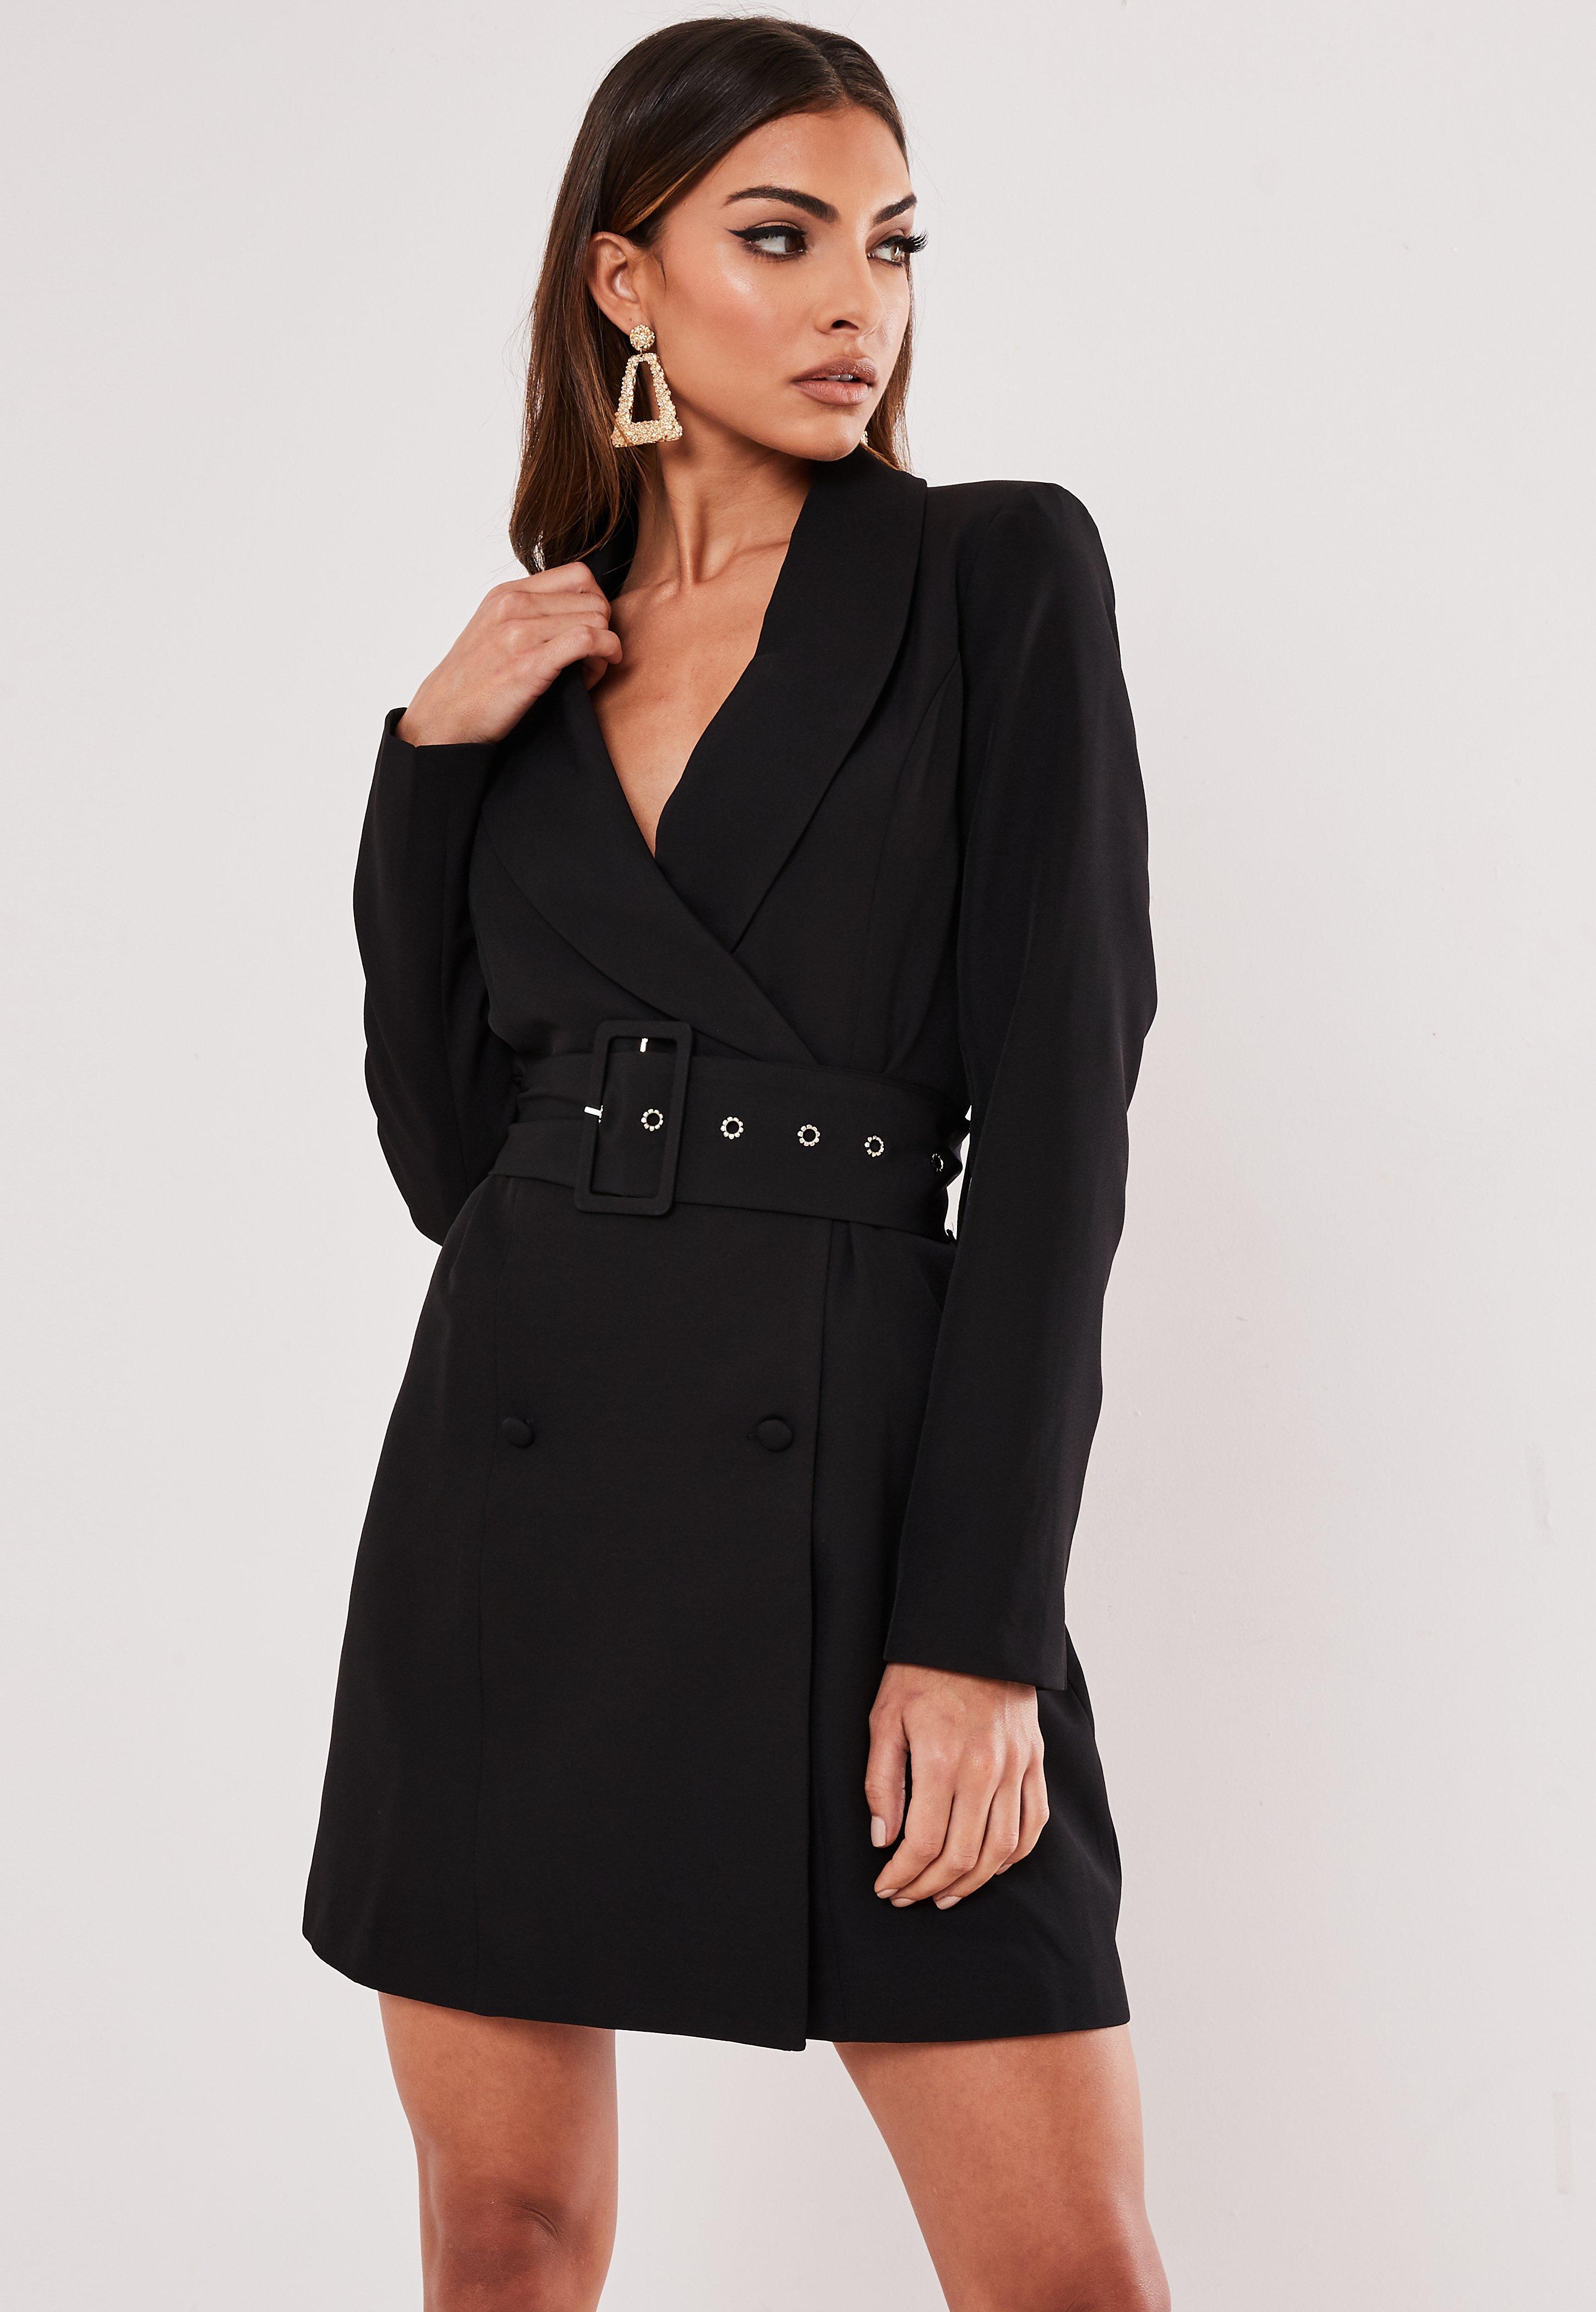 Robe blazer noire avec ceinture